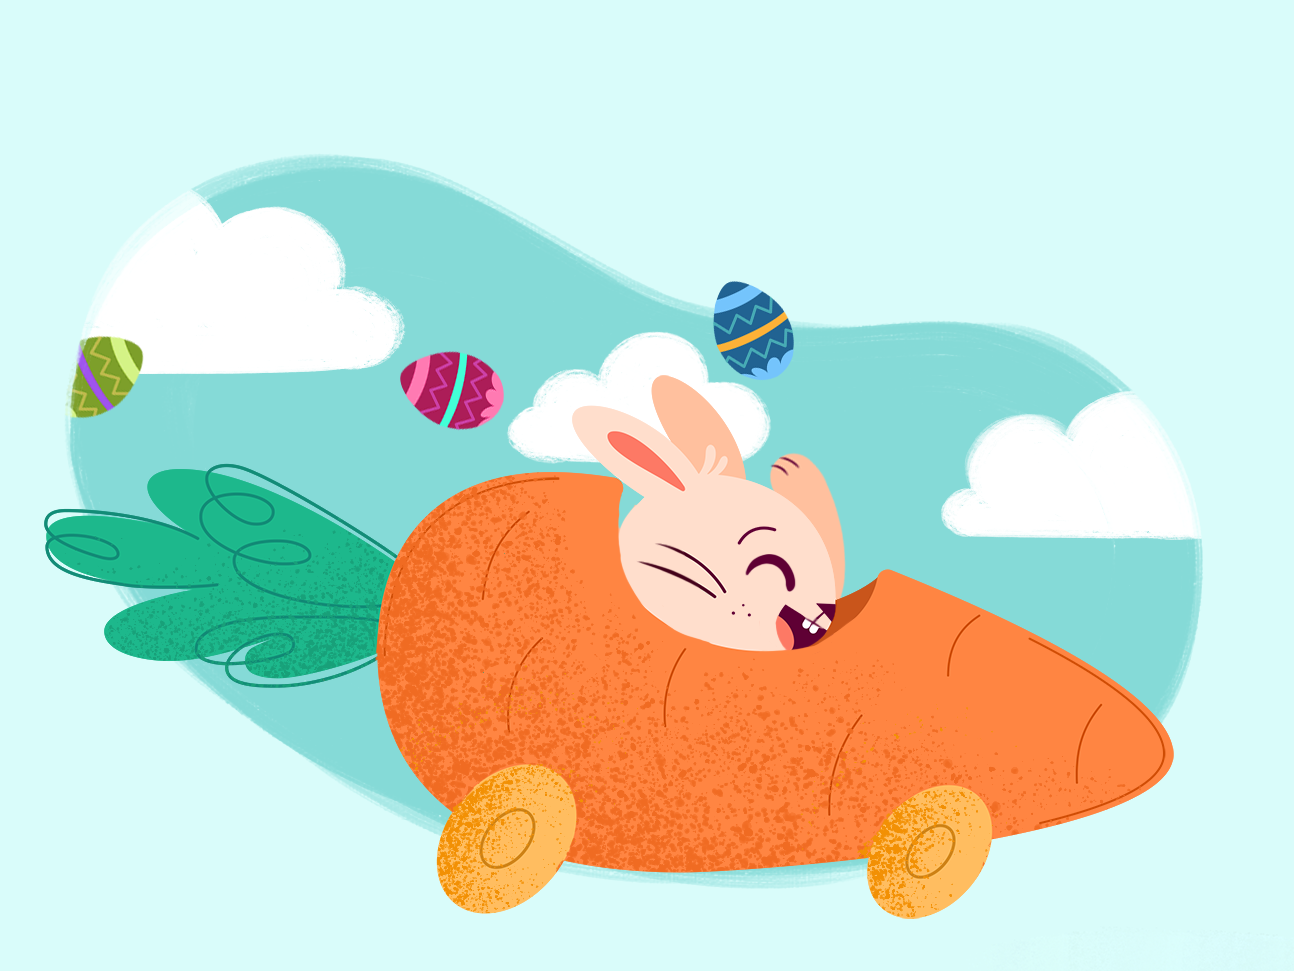 Easter Bunny art digital texture carrot bunny easter egg illustrator vector illustration